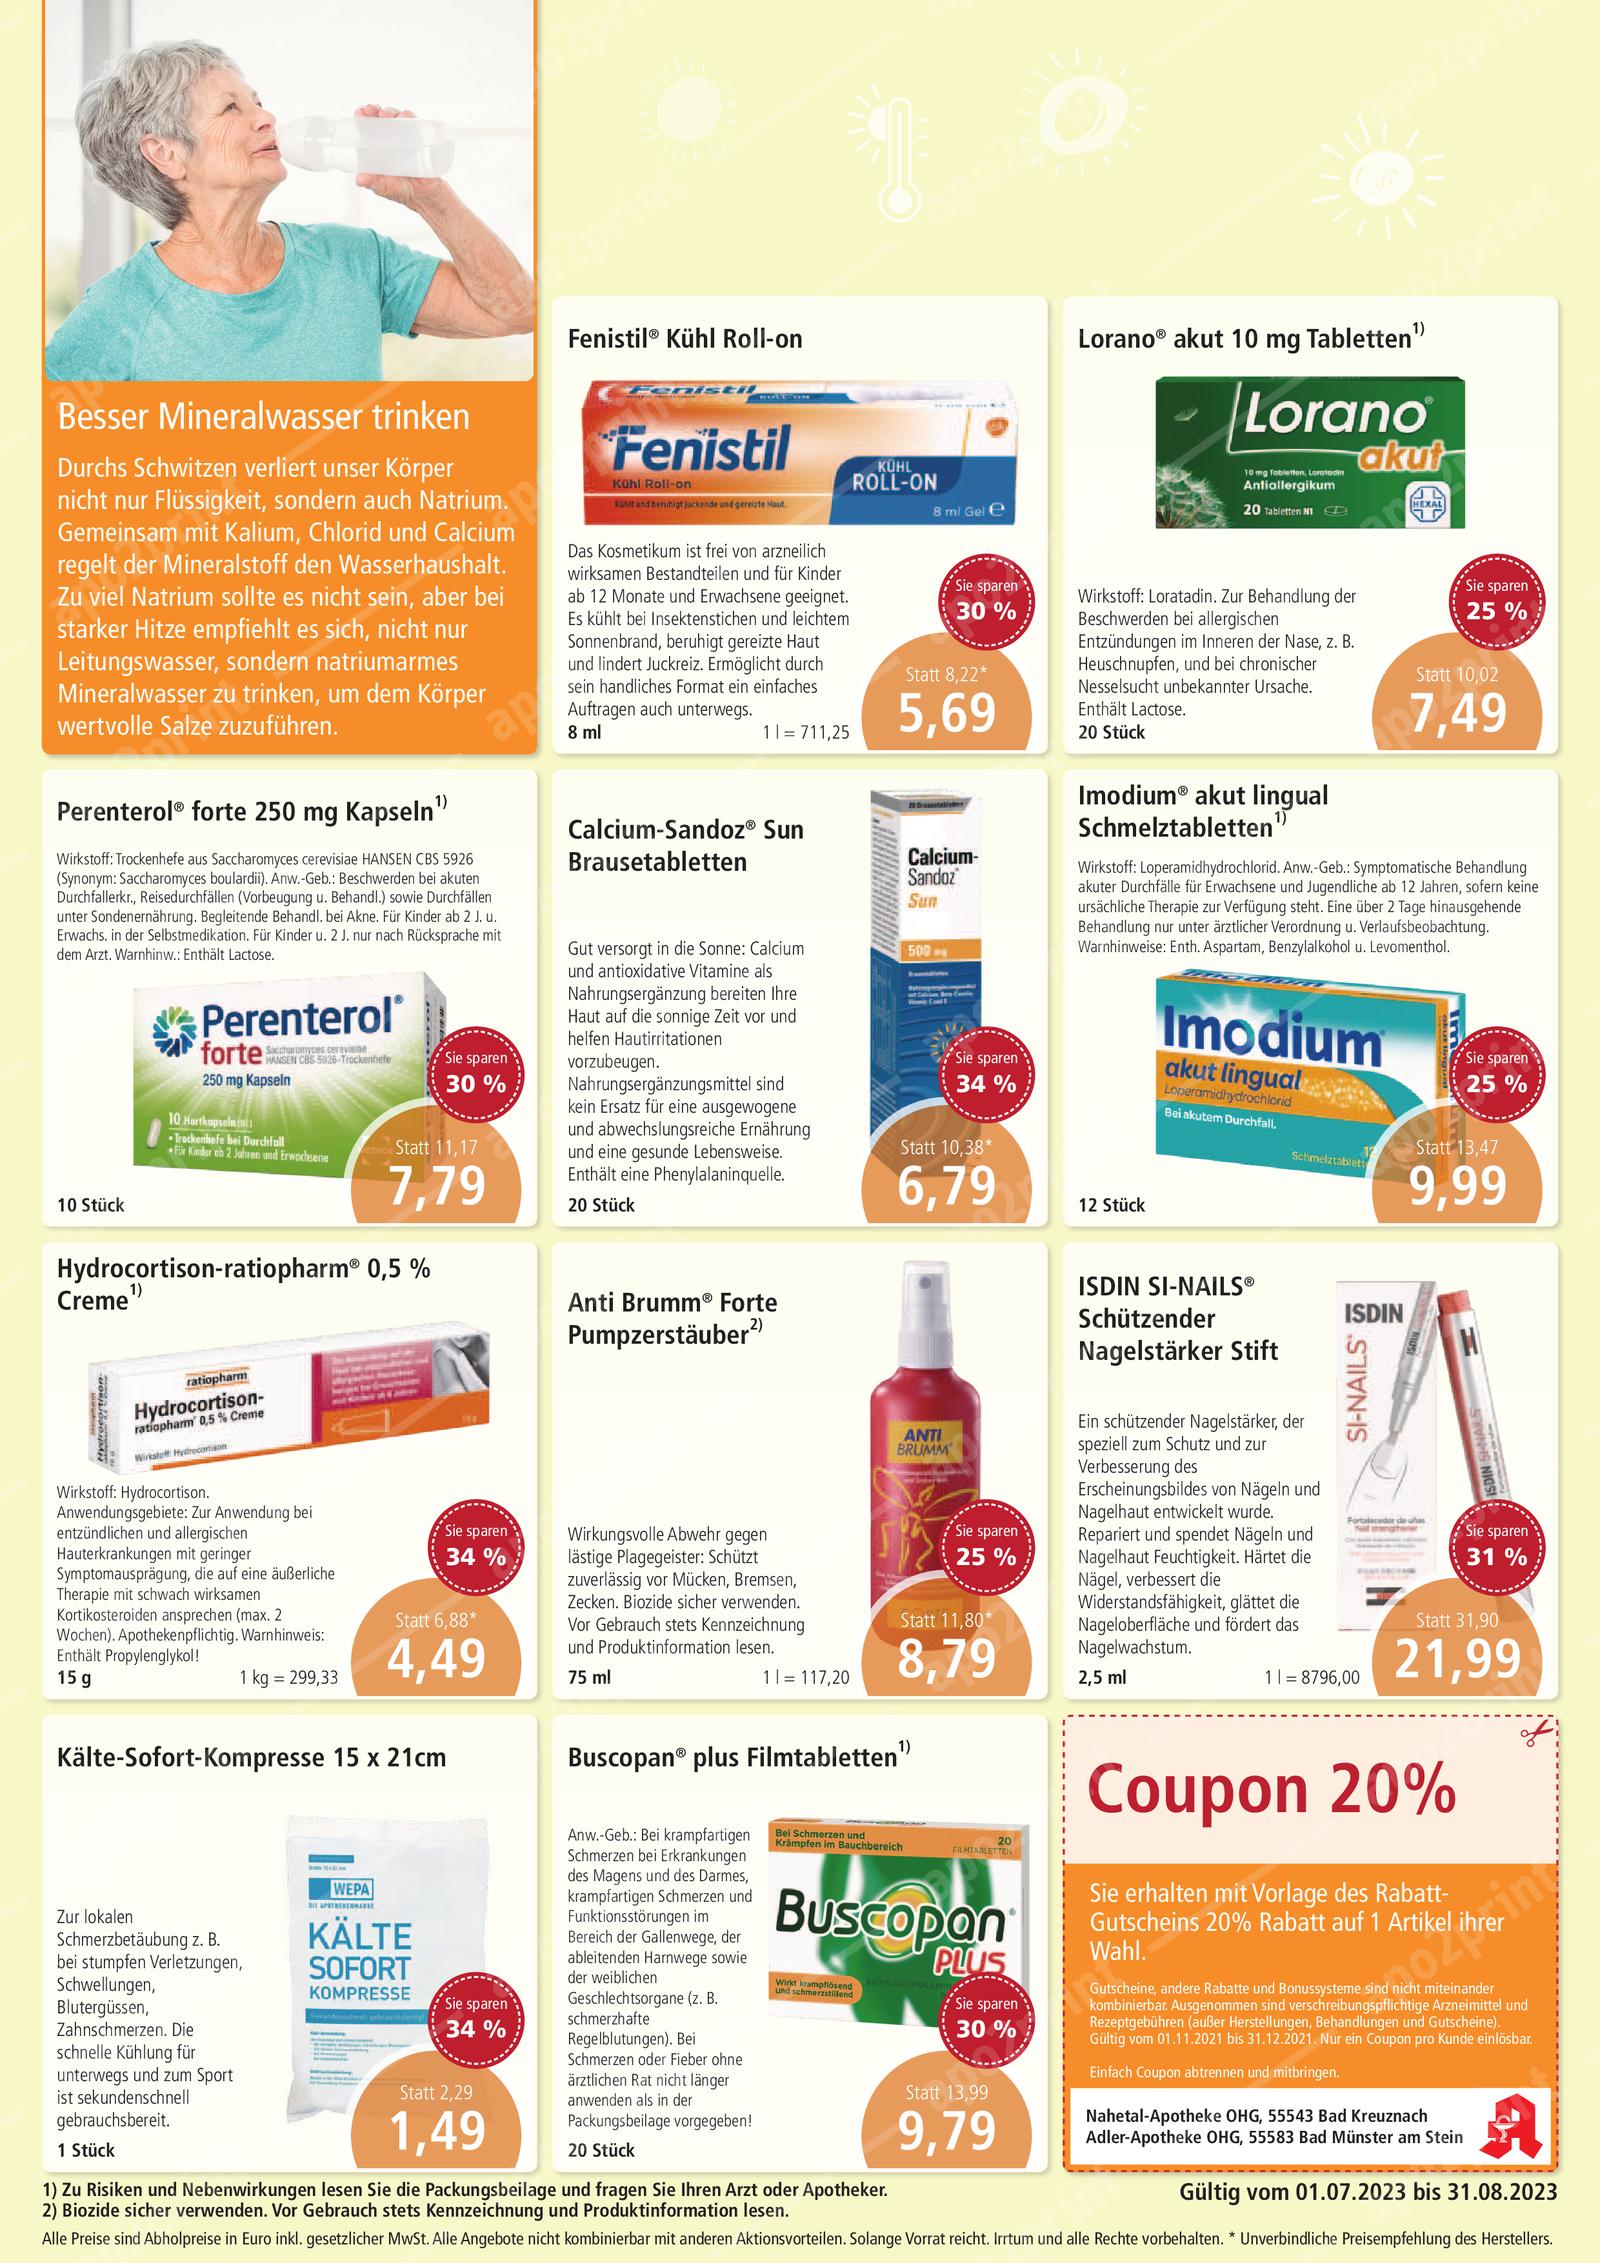 https://mein-uploads.apocdn.net/13119/leaflets/13119_flyer-Seite2.png